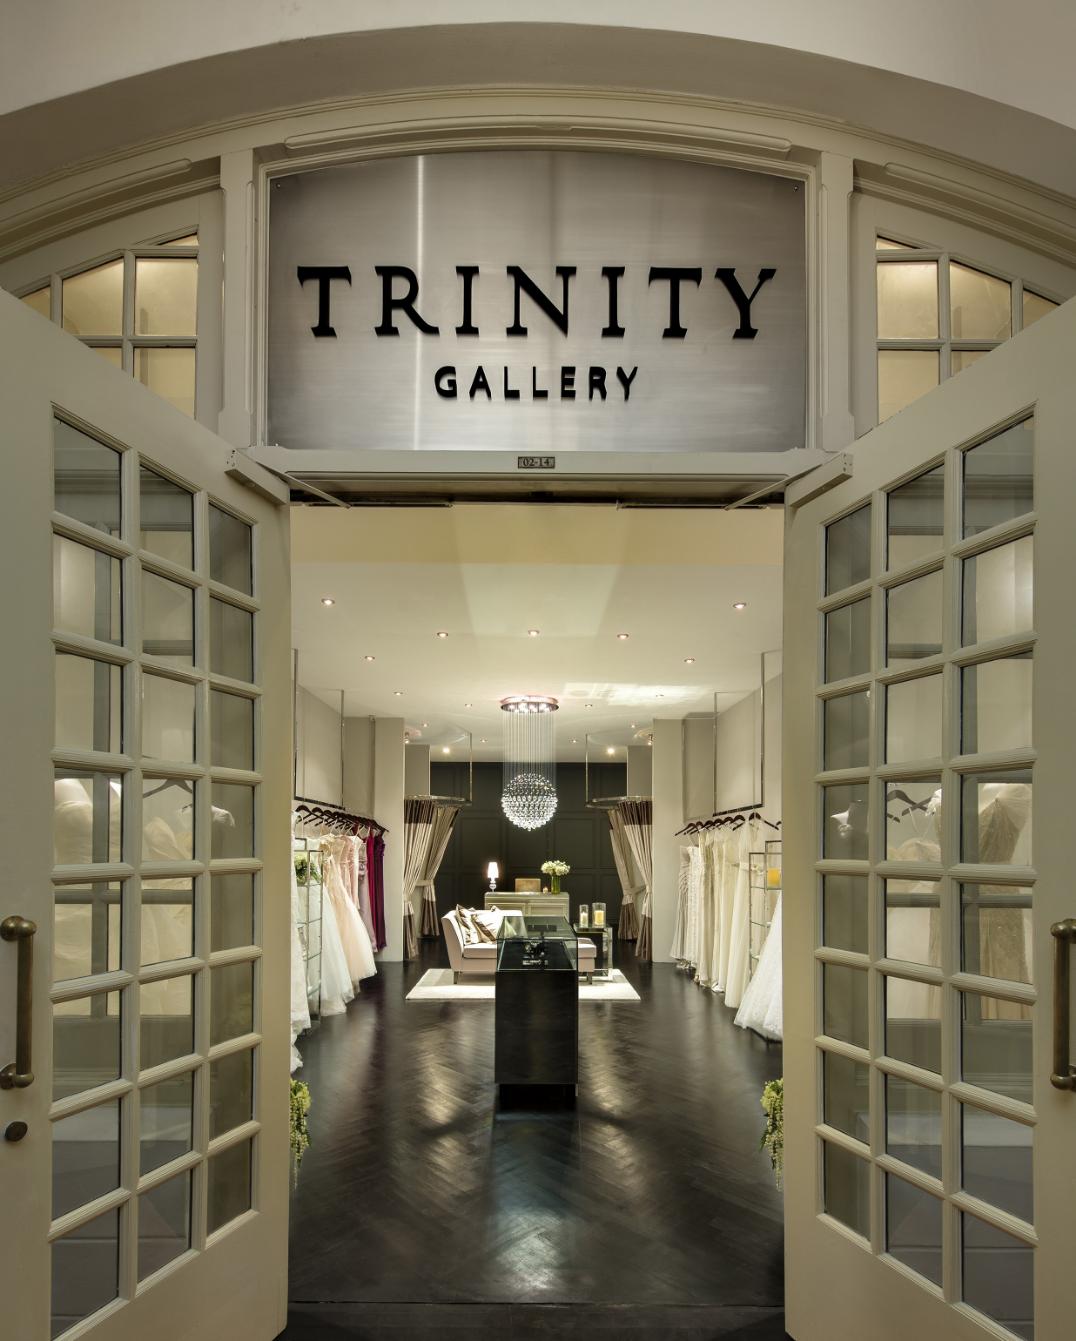 Trinity Gallery in Raffles Hotel, where we bring designers such as Oscar de la Renta , Monique Lhuillier, Jenny Packham, Reem Acra and Marchesa to Asian brides.